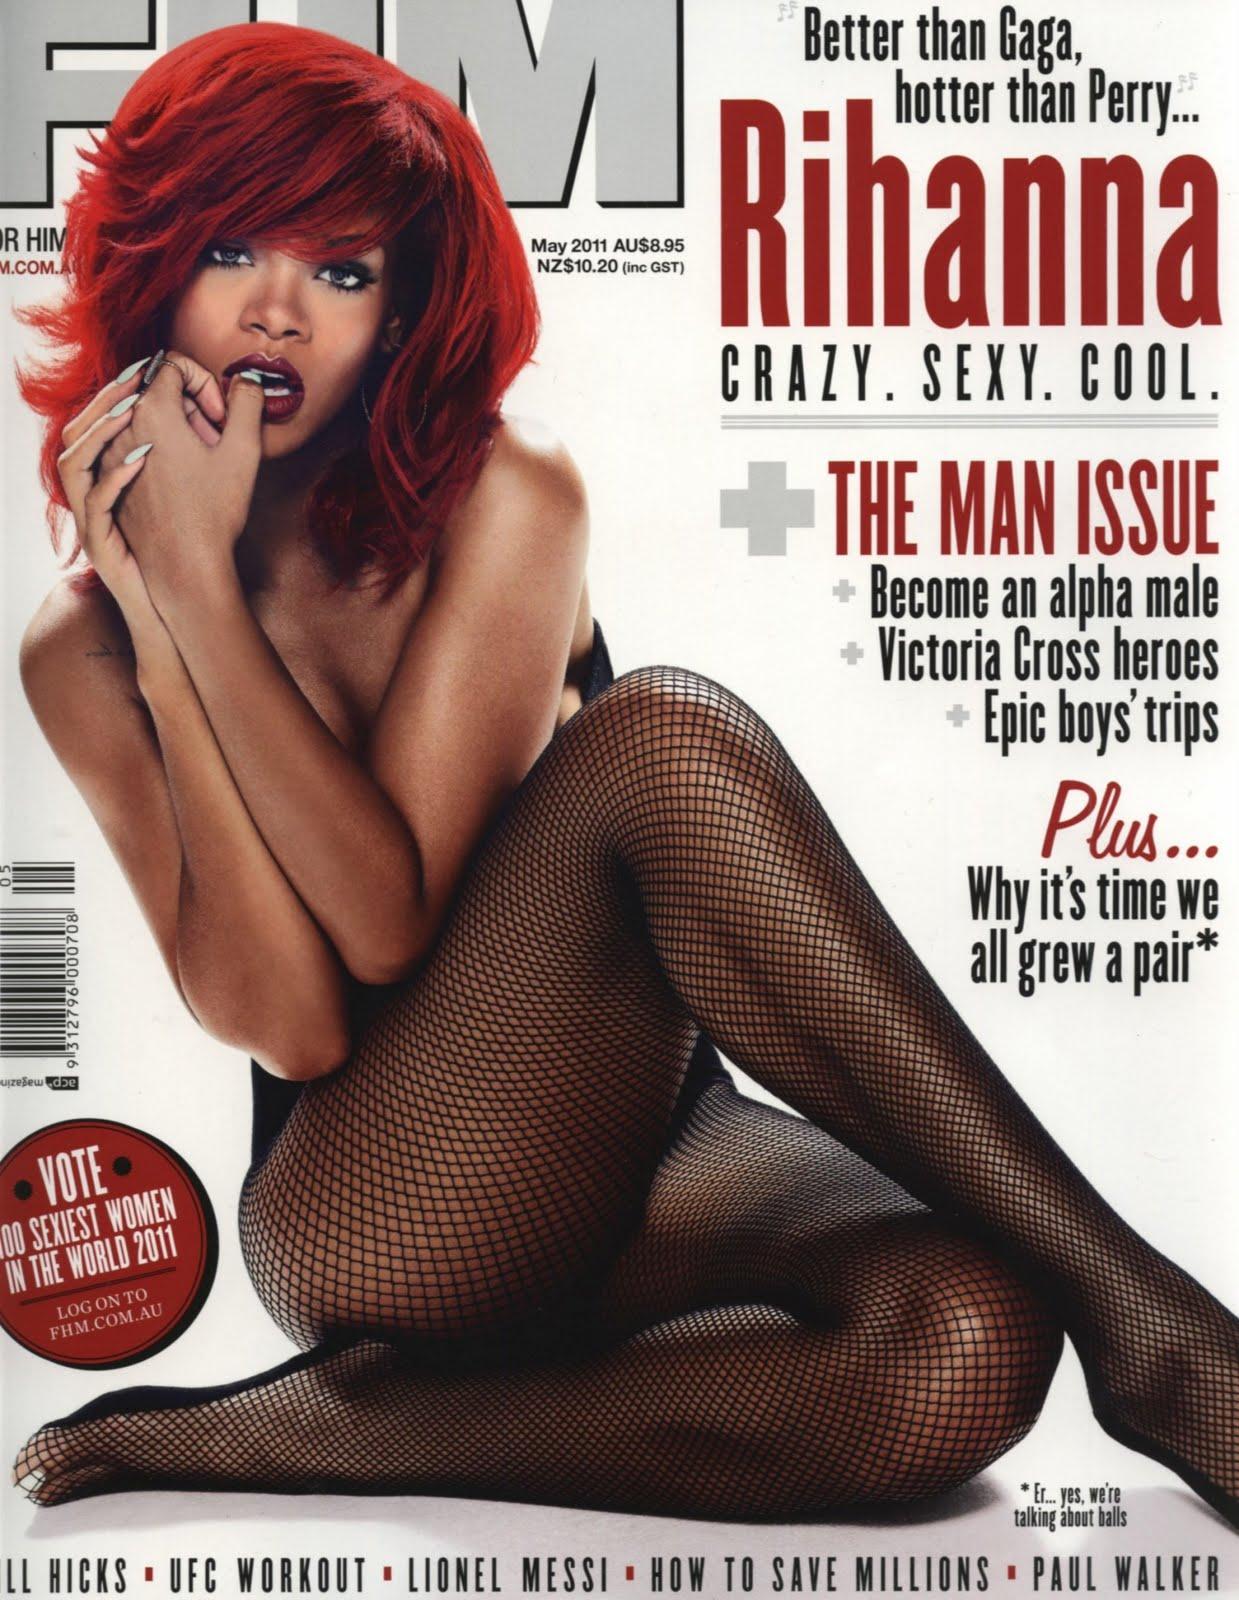 http://3.bp.blogspot.com/-iEo1l2iCIRg/TaWqXz6oLvI/AAAAAAAAUPc/bLADR3LLfv0/s1600/Rihanna-11.jpg